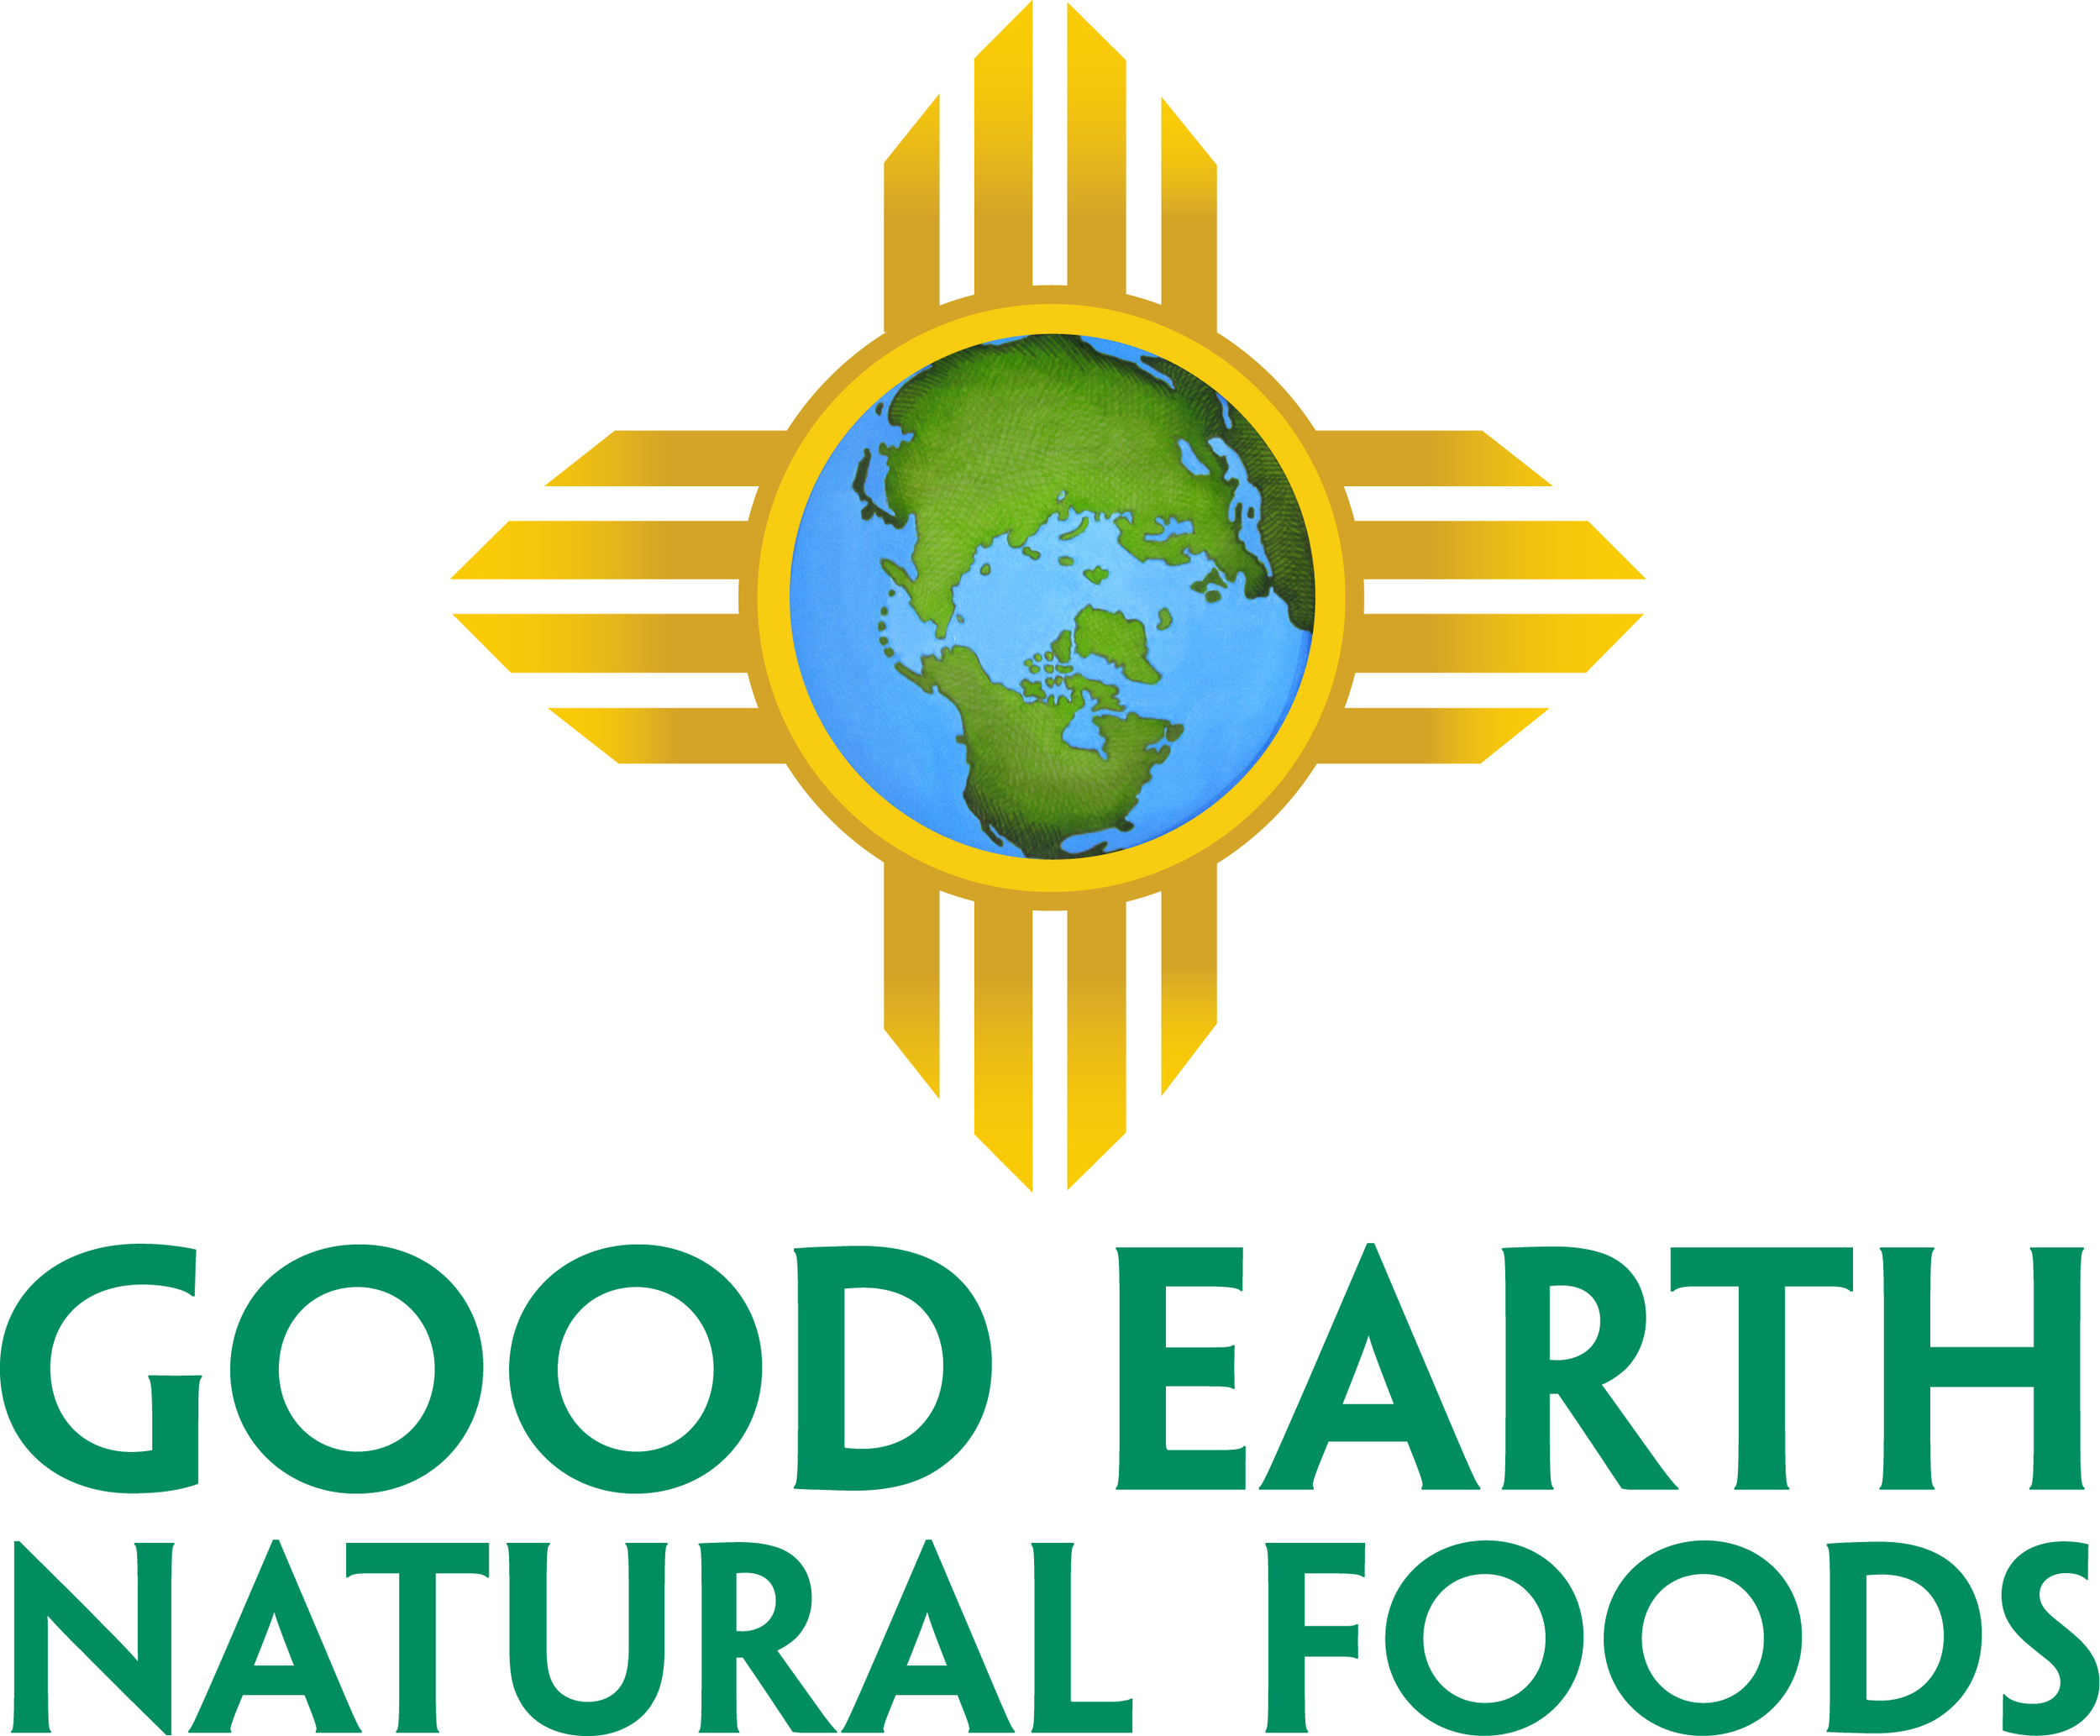 Good Earth Natural Foods_0.jpg